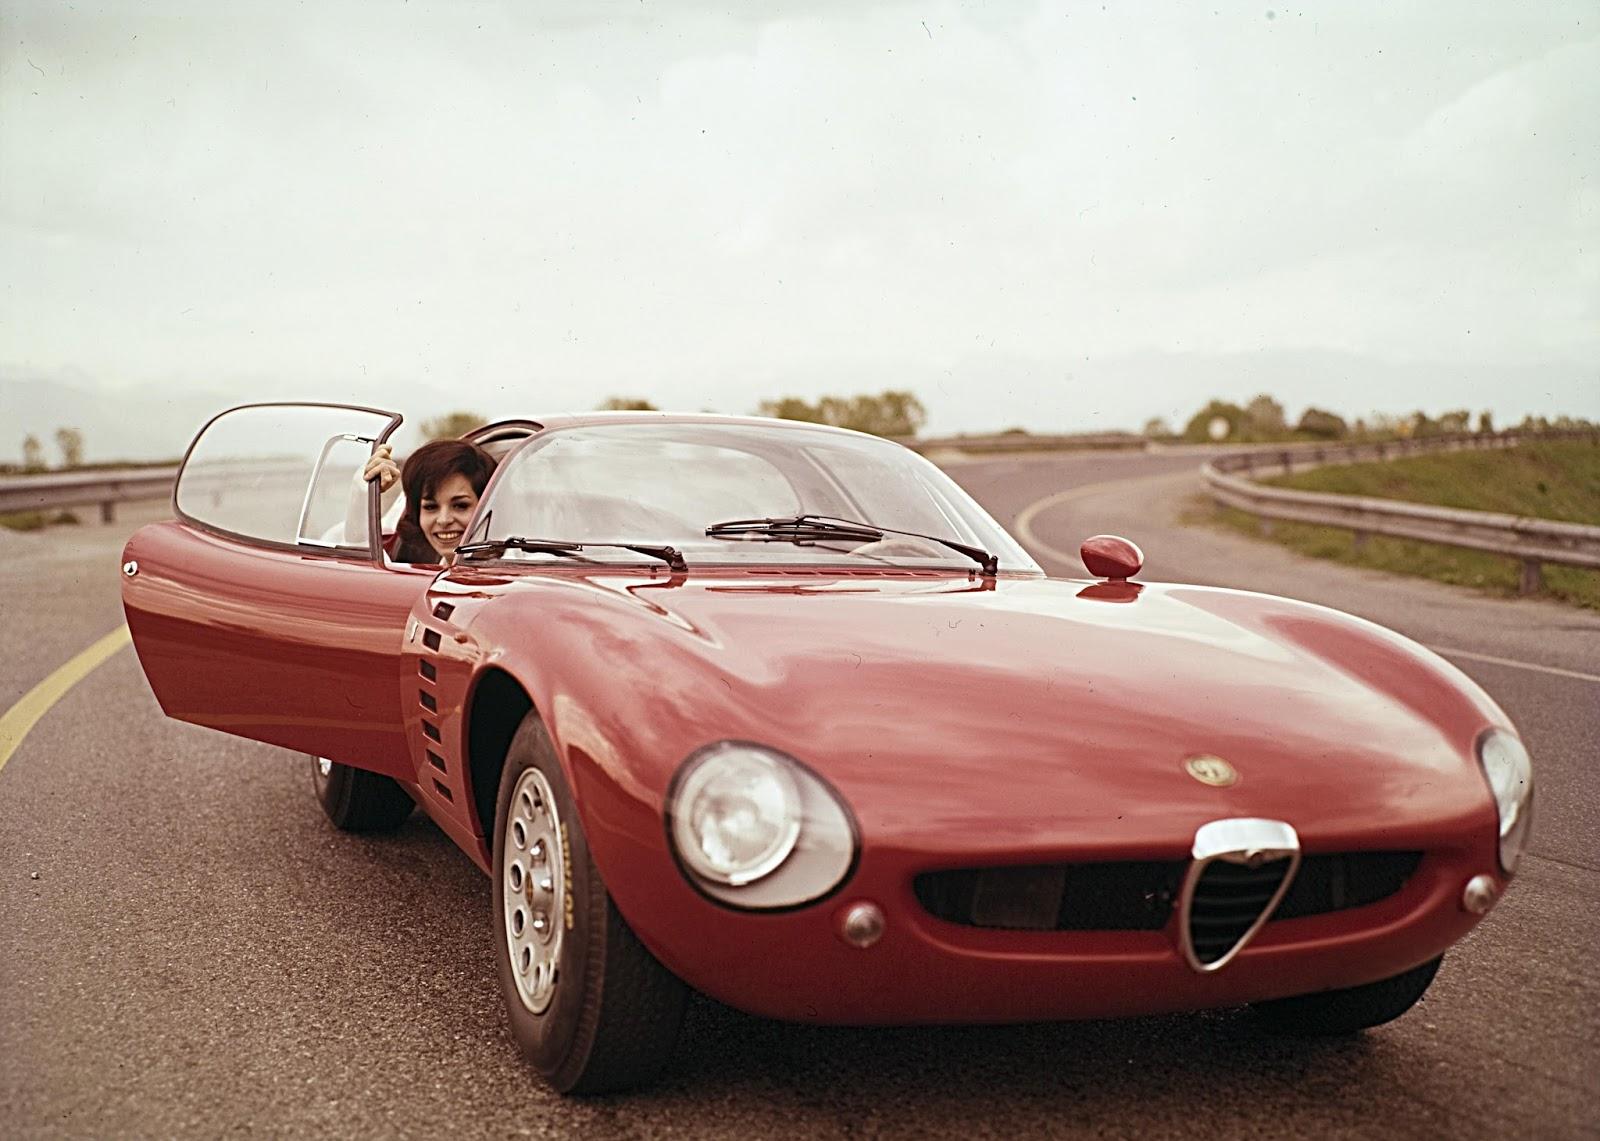 stormwheels 1964 italia carrozzeria bertone alfa romeo canguro prototipo marciante. Black Bedroom Furniture Sets. Home Design Ideas